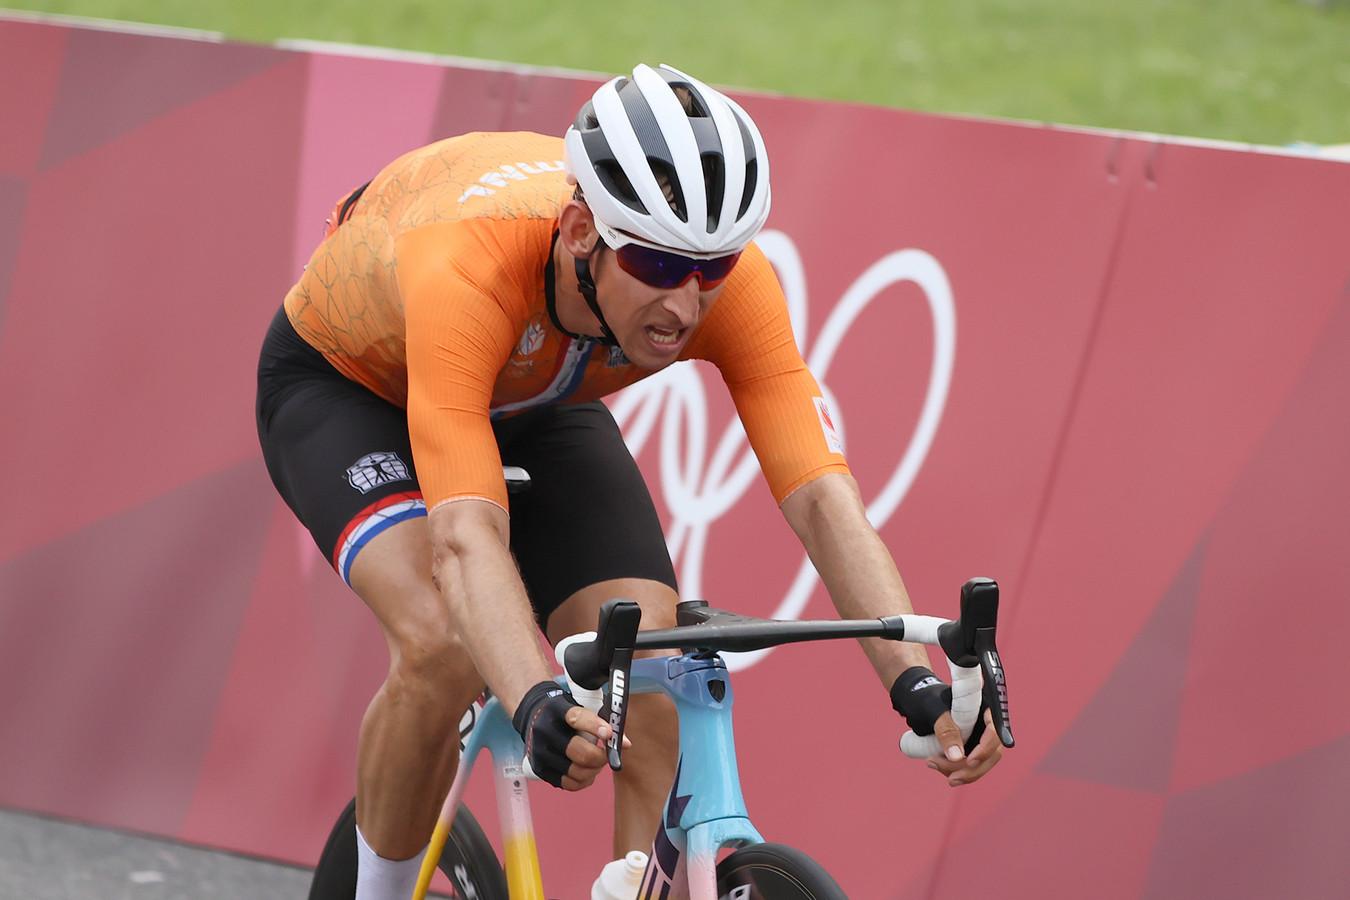 Bauke Mollema greep in Tokio net naast de medailles.